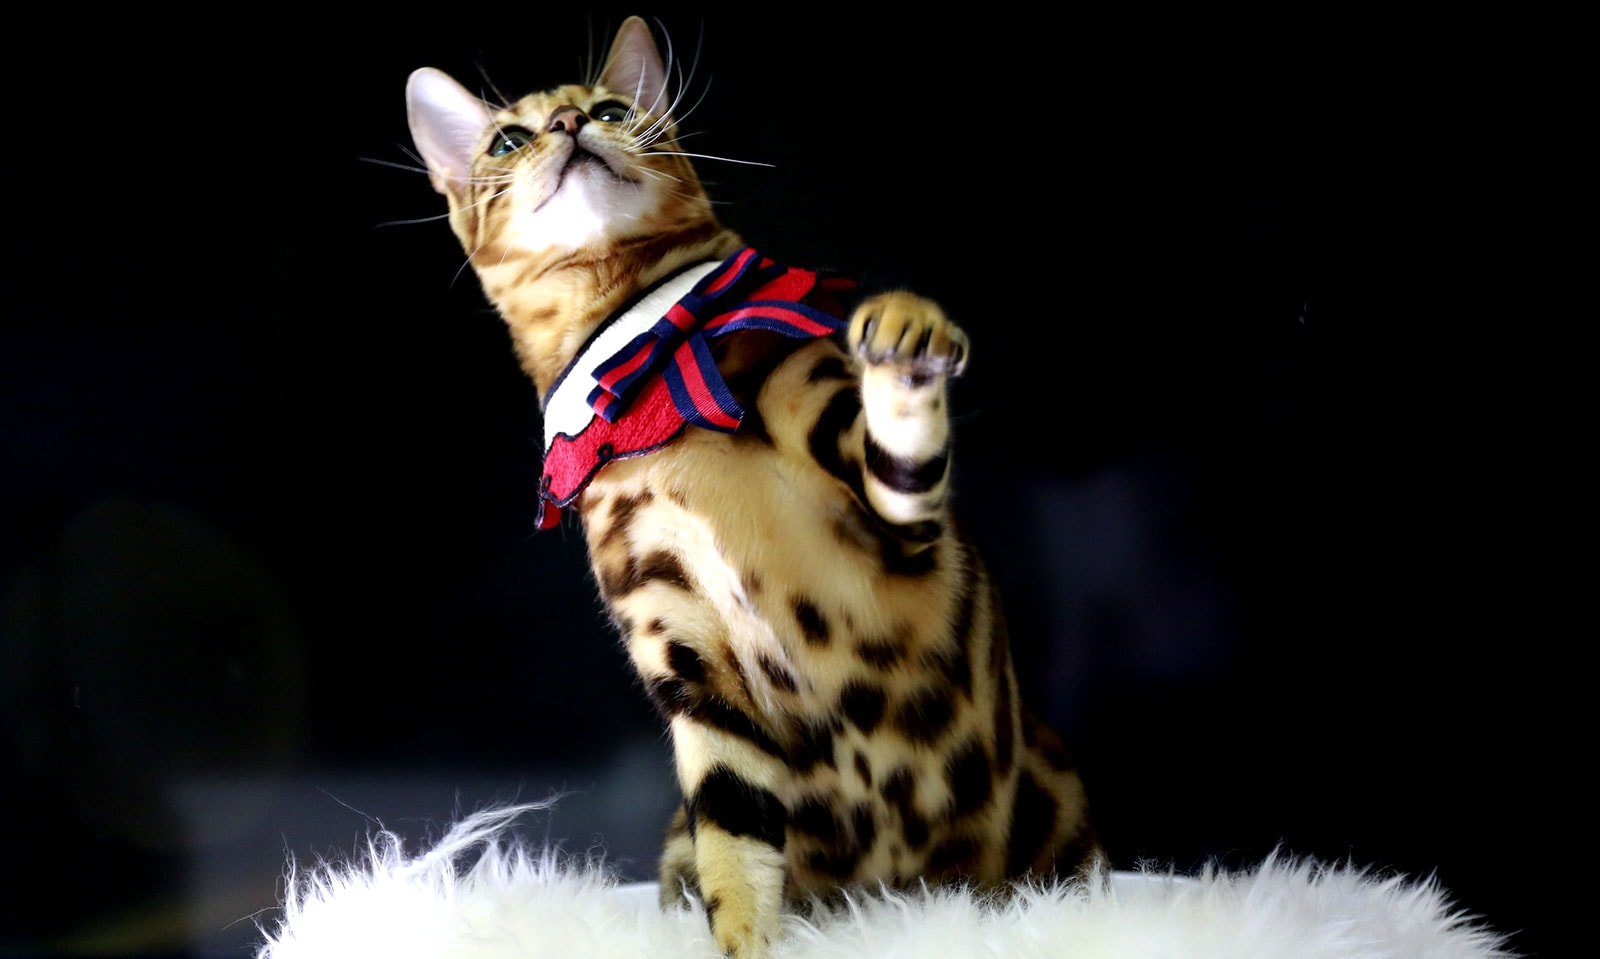 Bengalkatze - Prionailurus bengalensis oder Leopardkatze